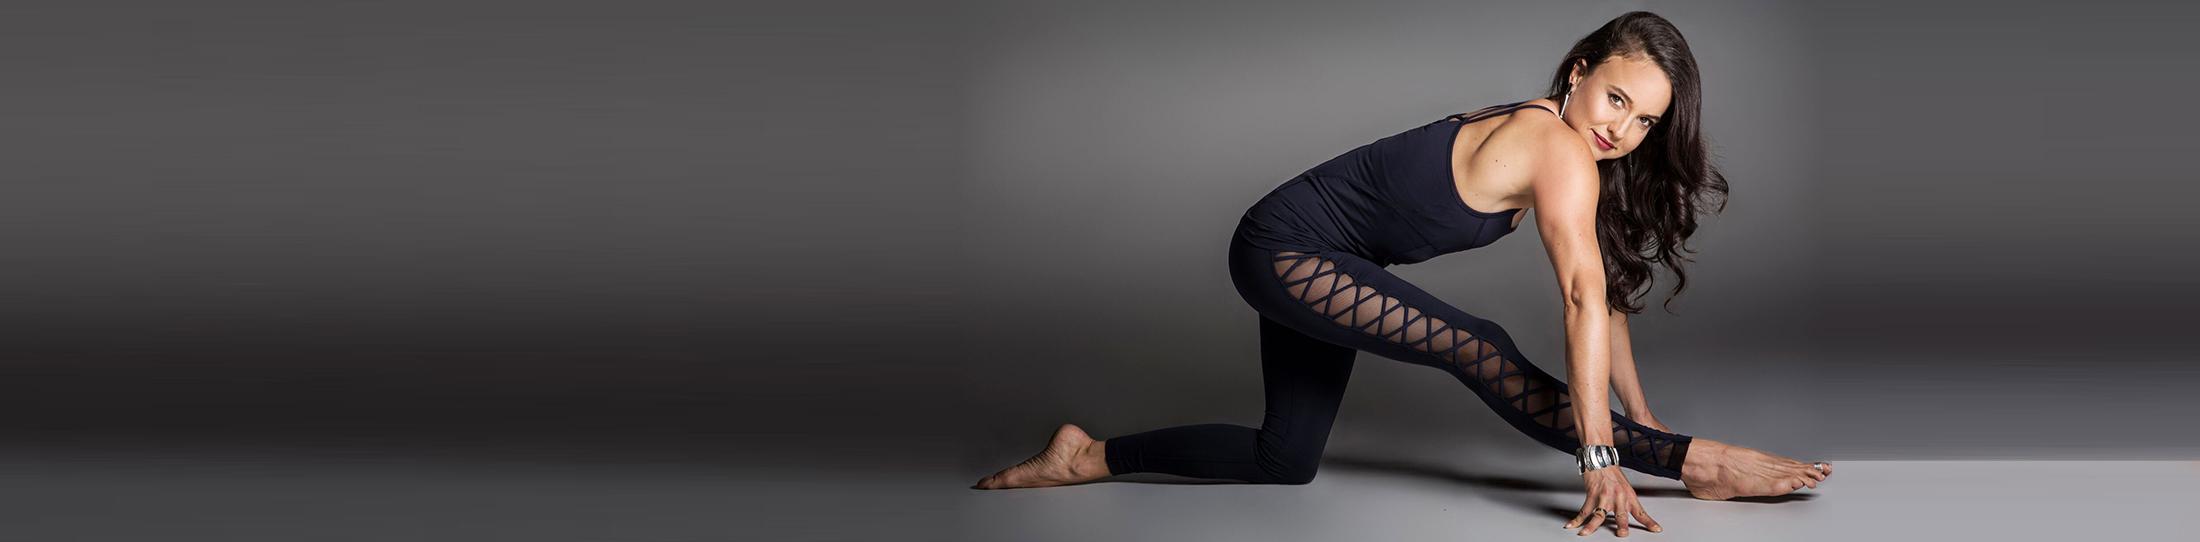 yoga-bottoms-category.jpg